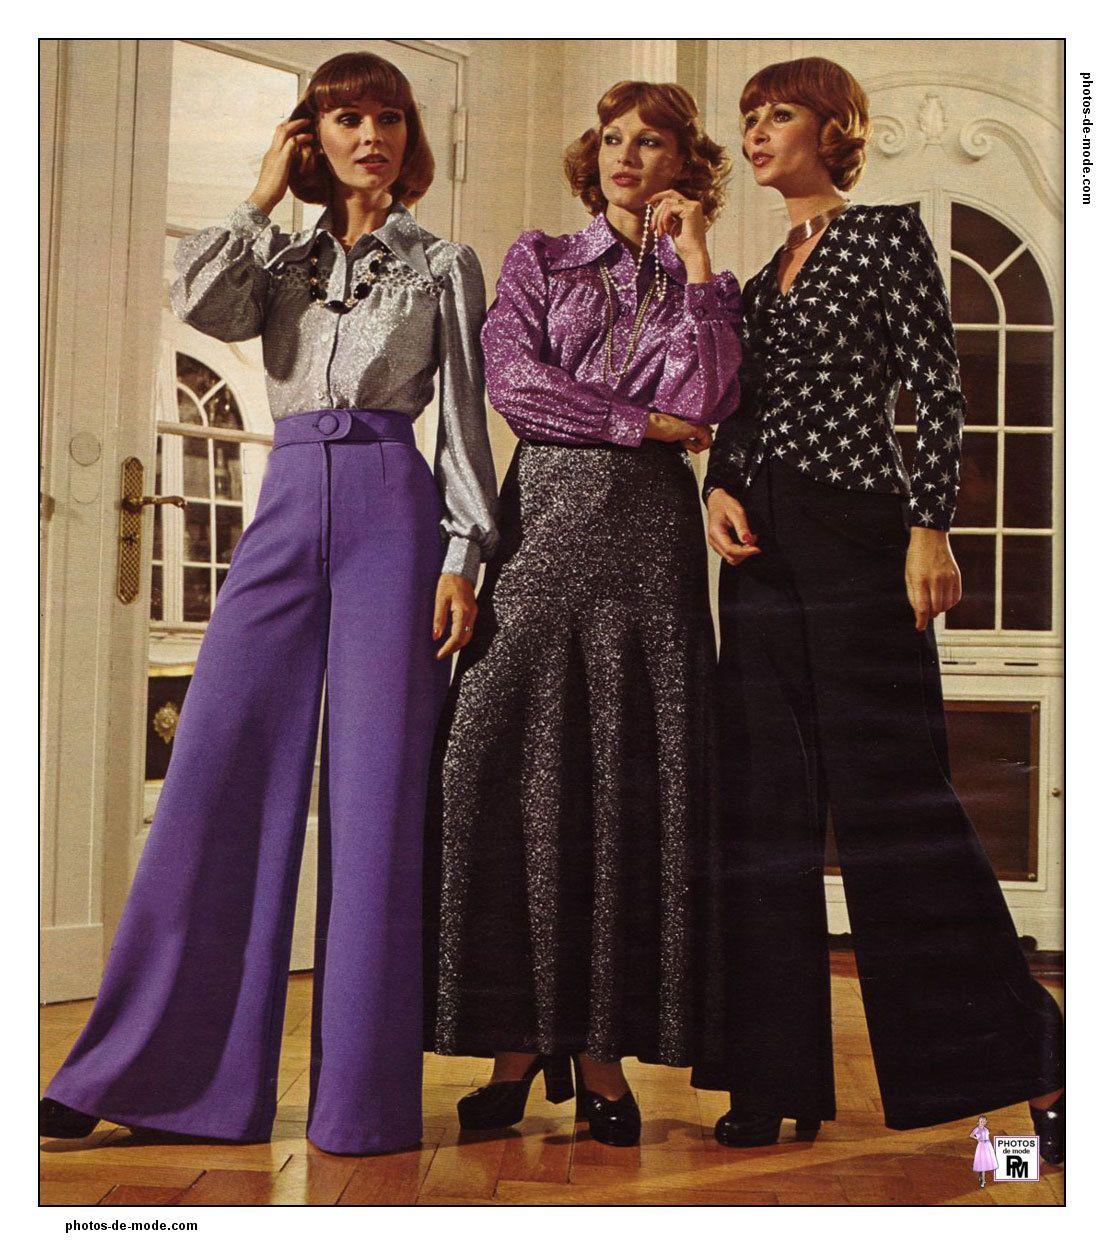 pingl par manola sourideth sur 1960 1970 mode en 2018 pinterest mode ann e 70 mode et. Black Bedroom Furniture Sets. Home Design Ideas